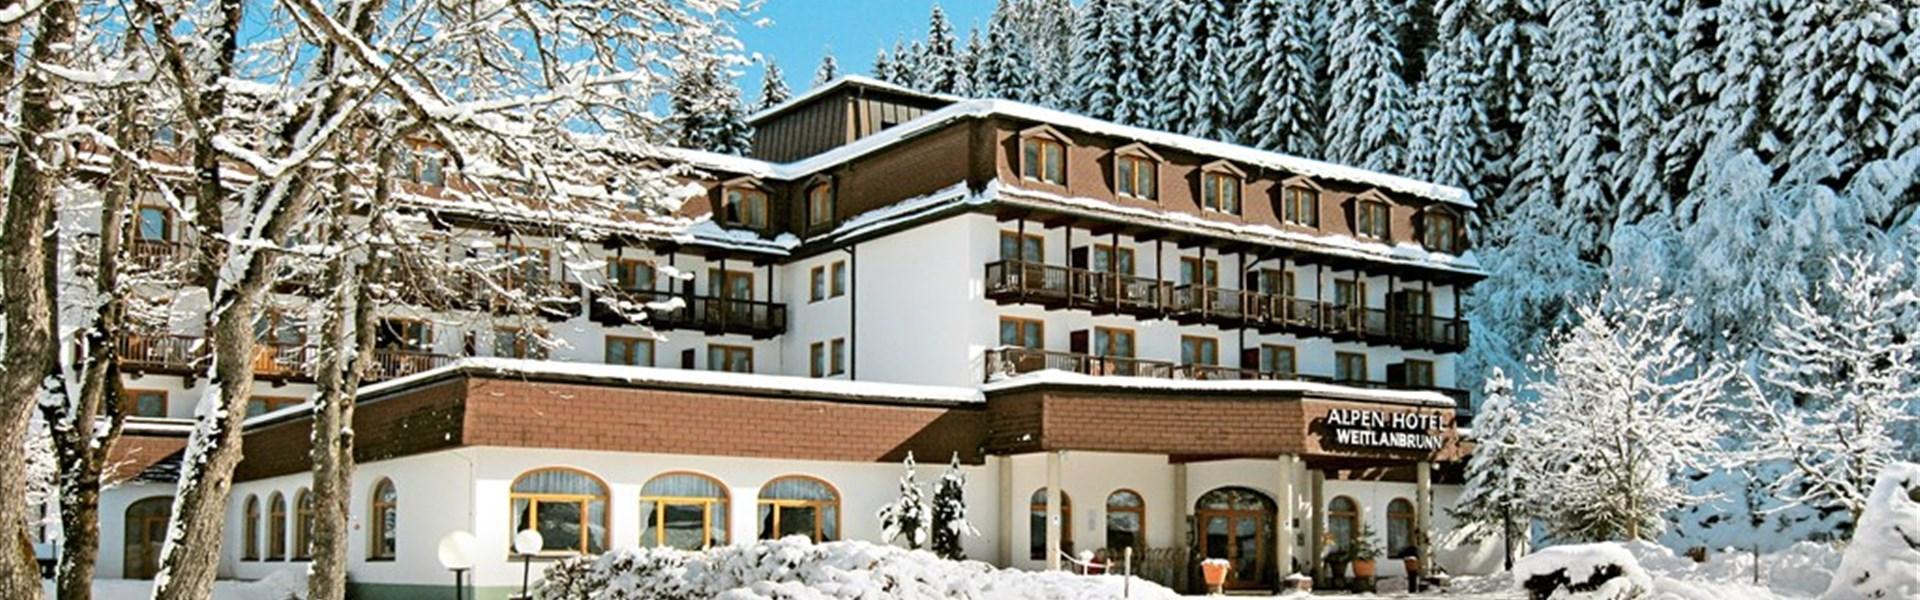 Marco Polo - Alpenhotel Weitlanbrunn W22 -